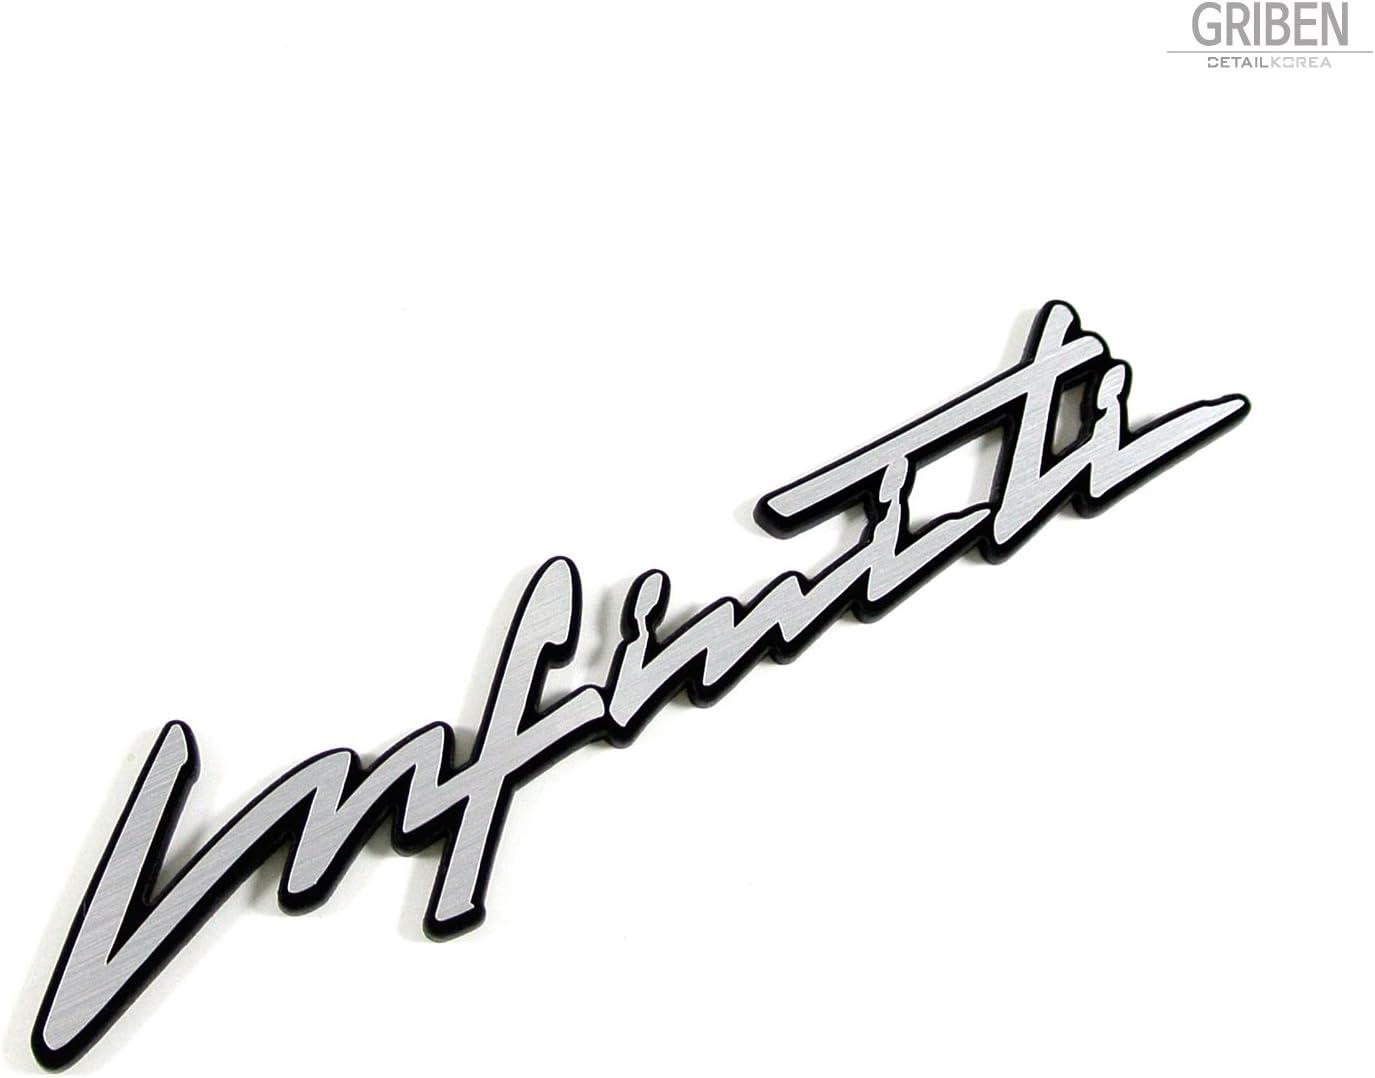 Griben Car Badge Full Name Cursive Lettering Emblem 30098